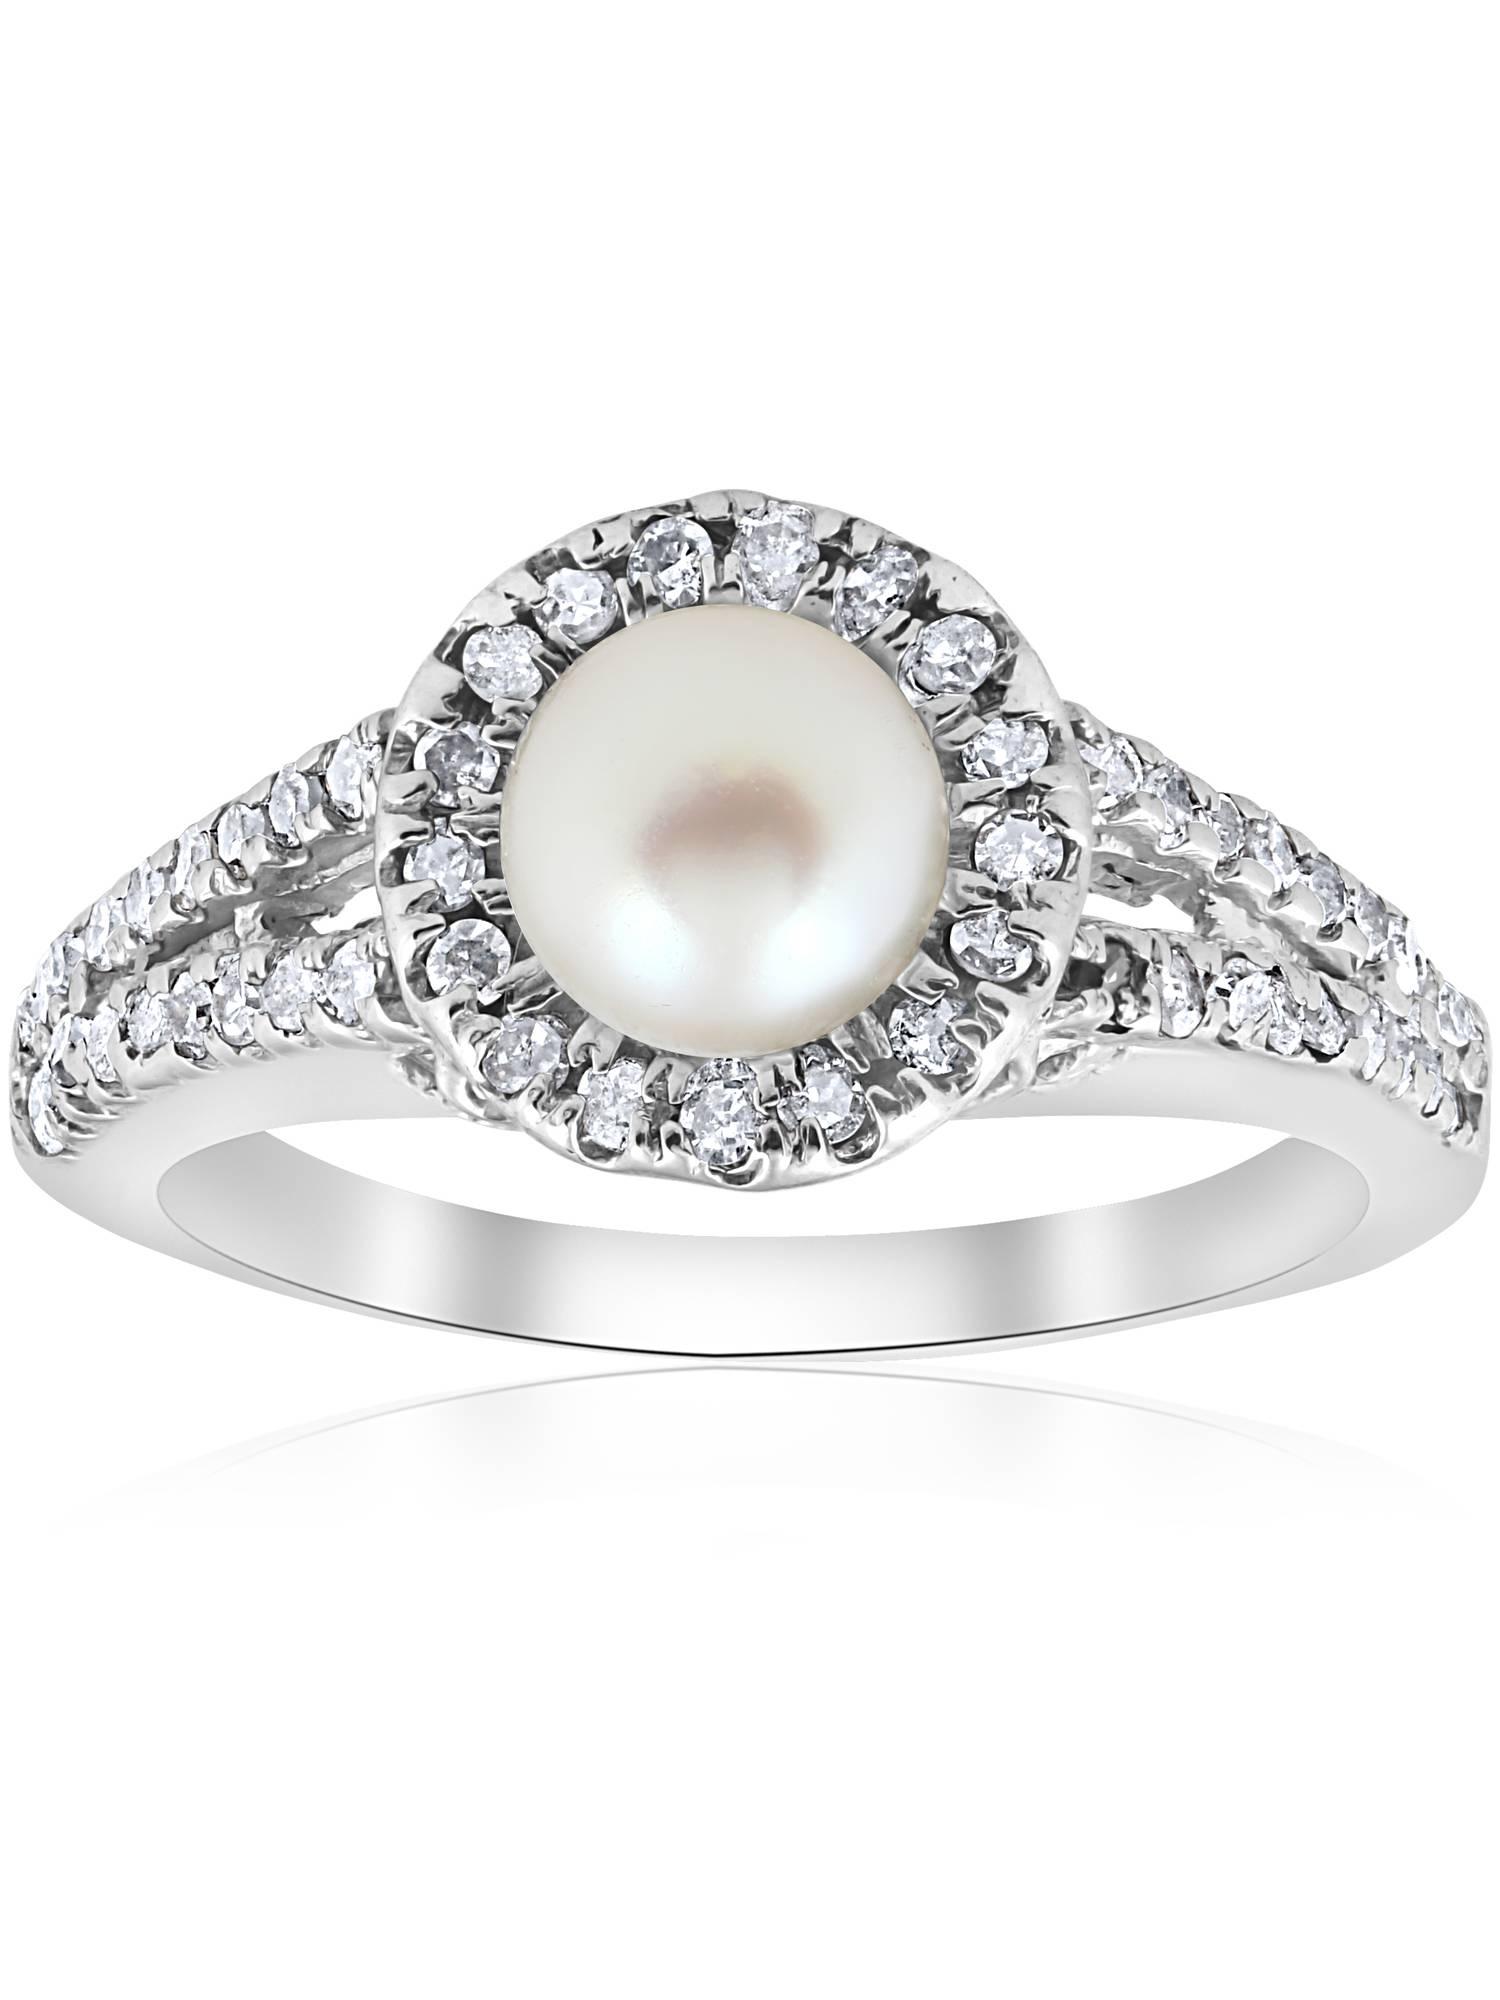 Diamond Pearl Halo Ring 14K White Gold